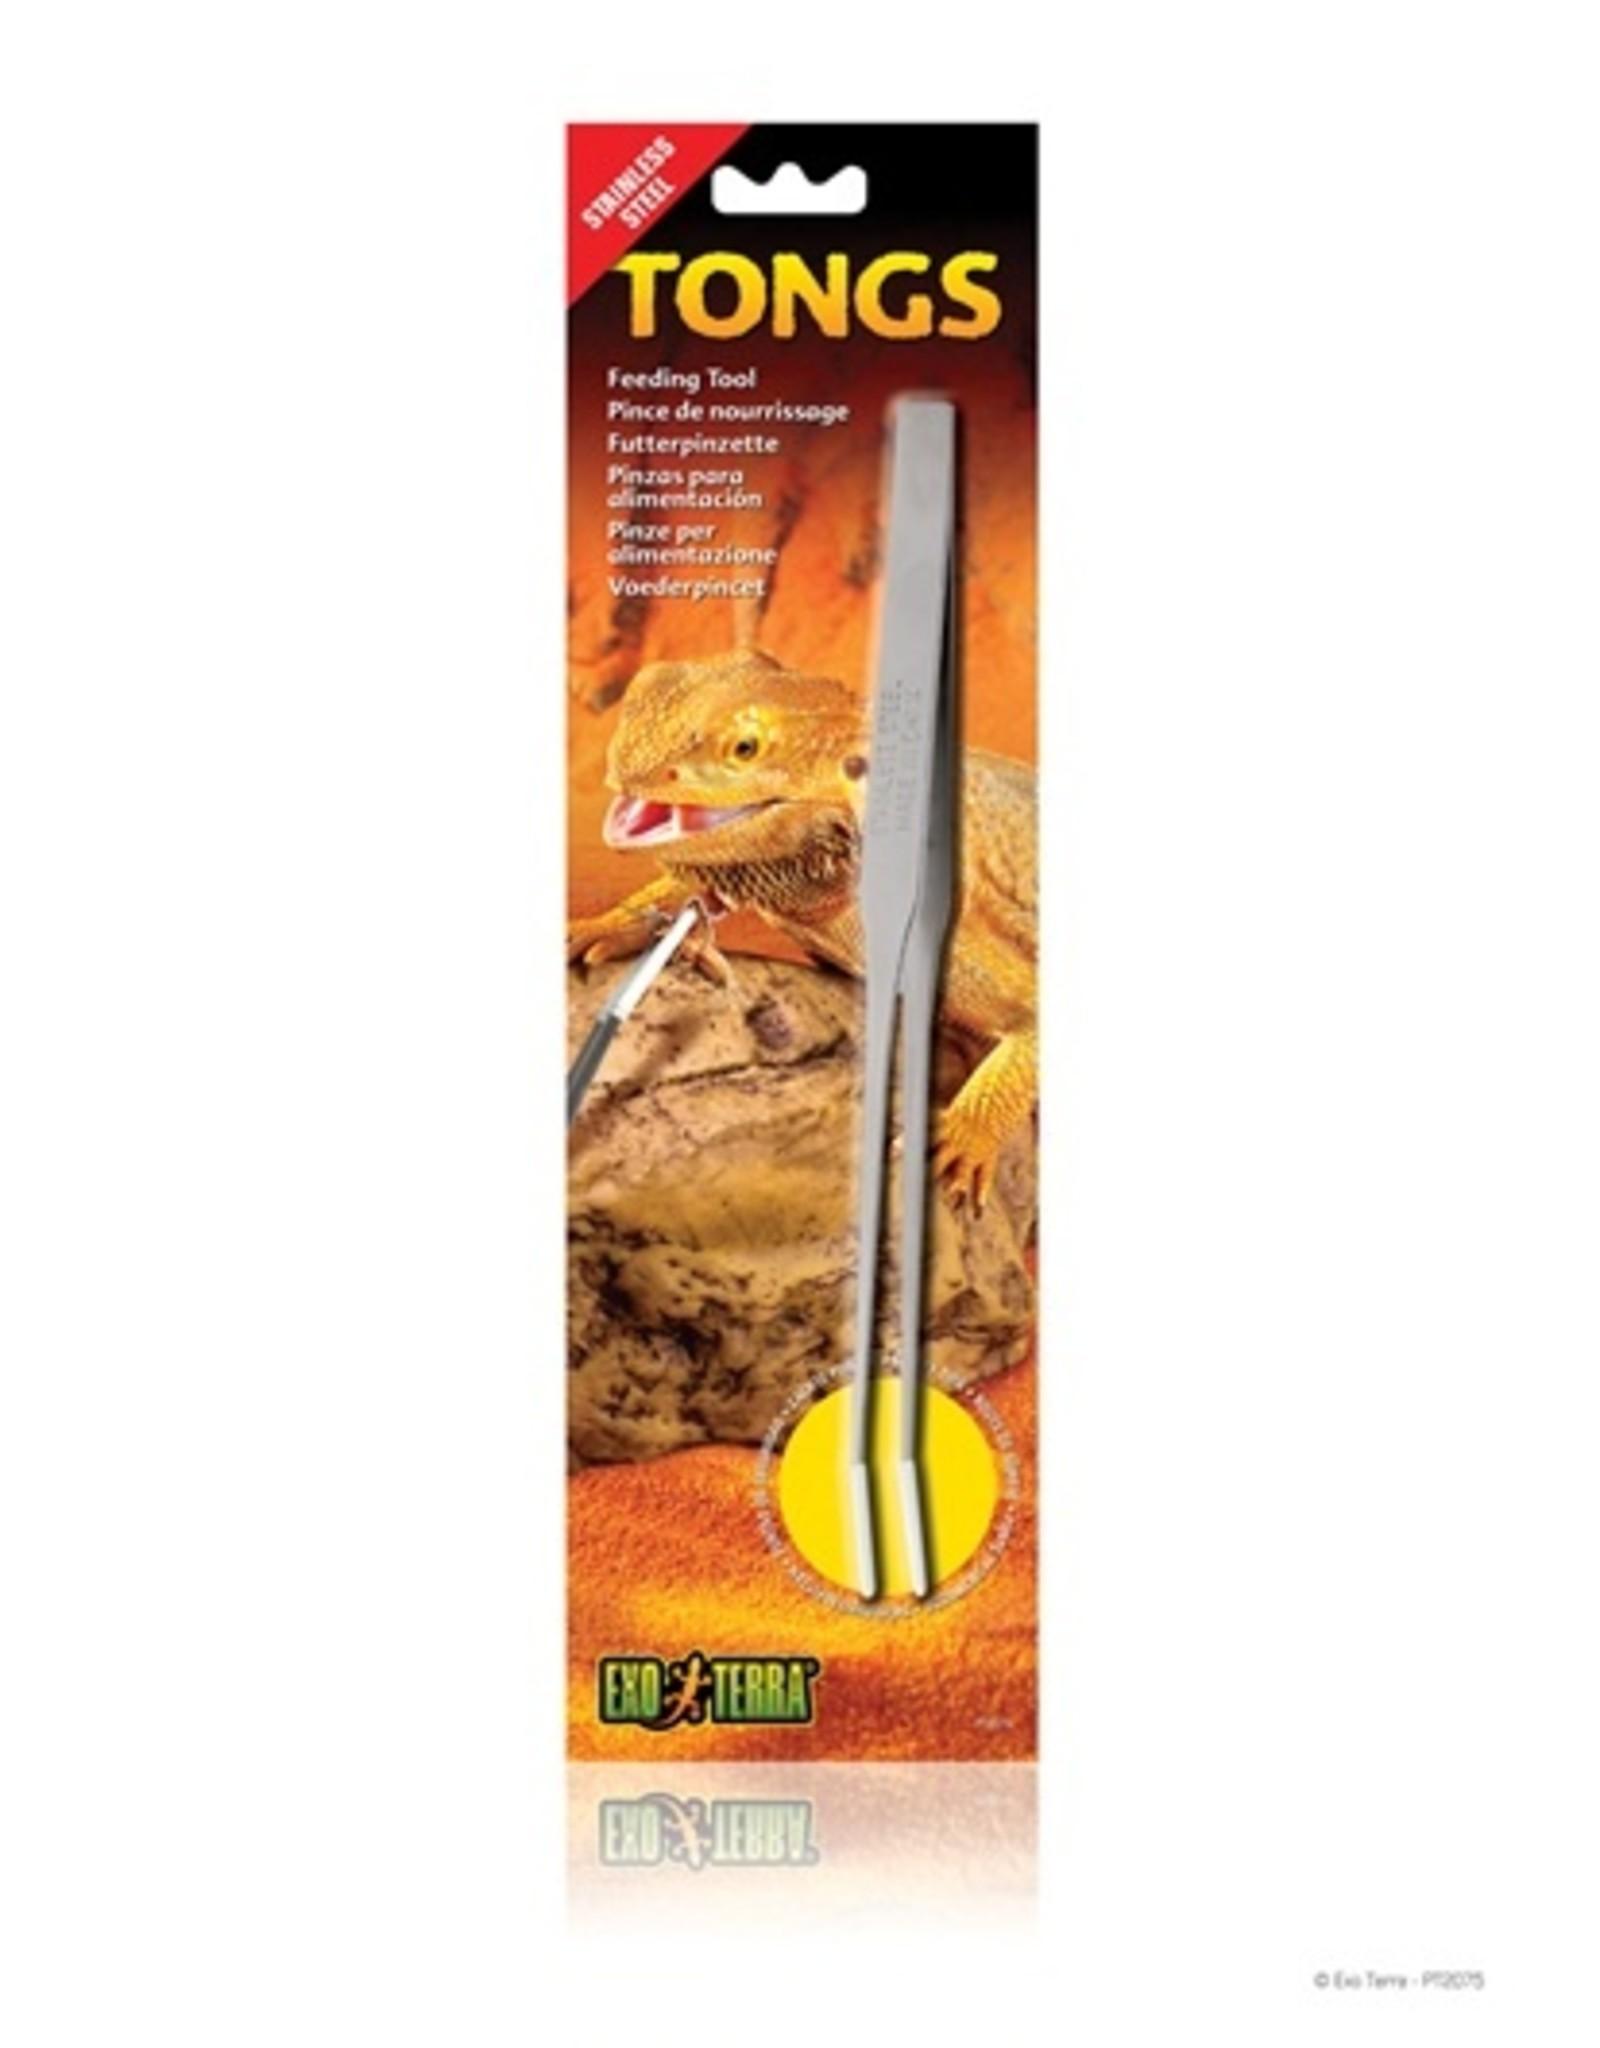 Exo Terra EXO TERRA Tongs - Feeding Tool